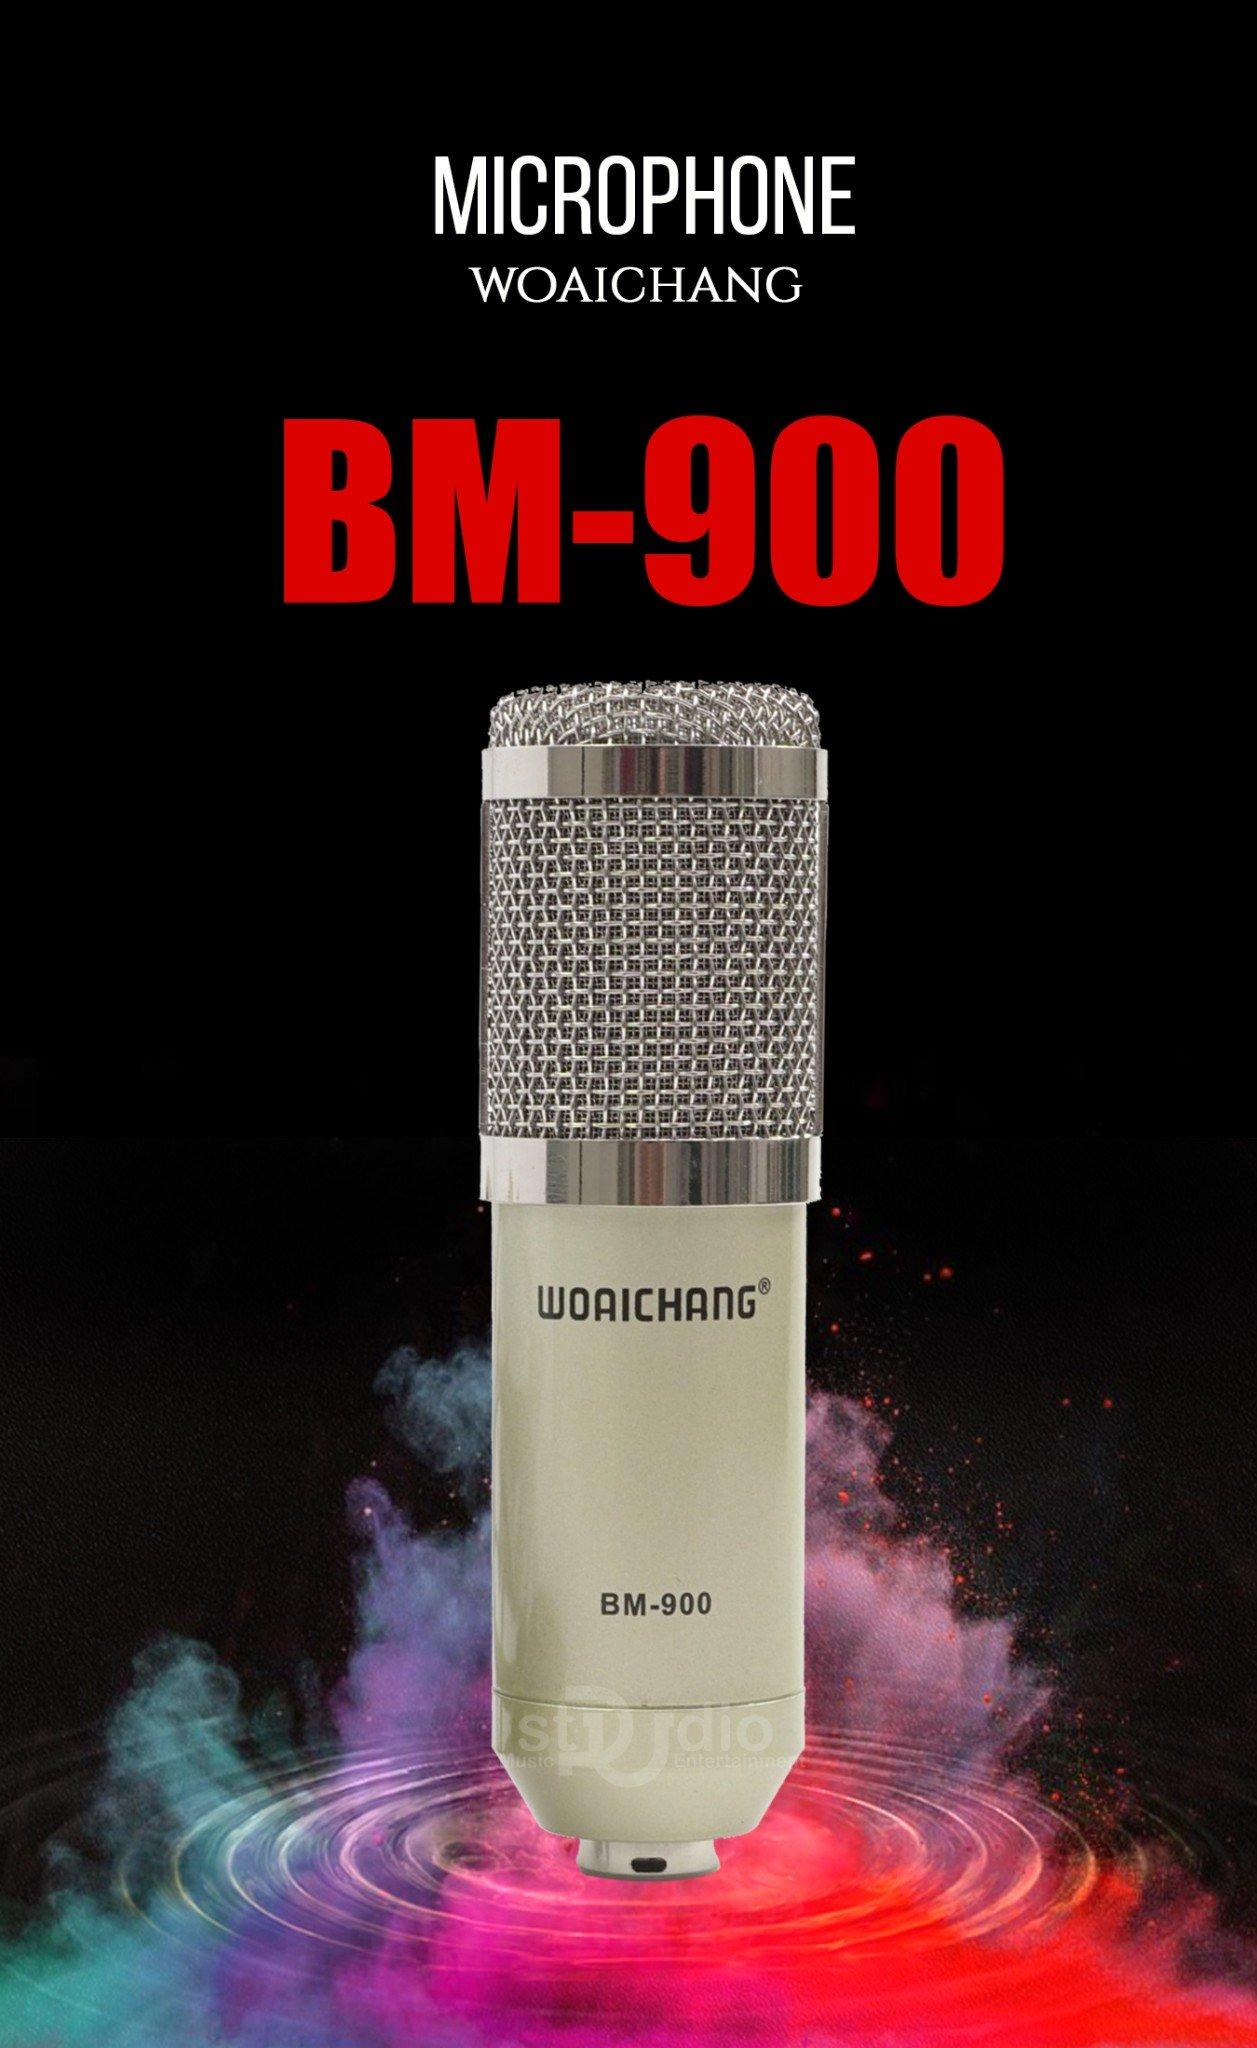 MICRO THU ÂM WOAI CHANG BM900